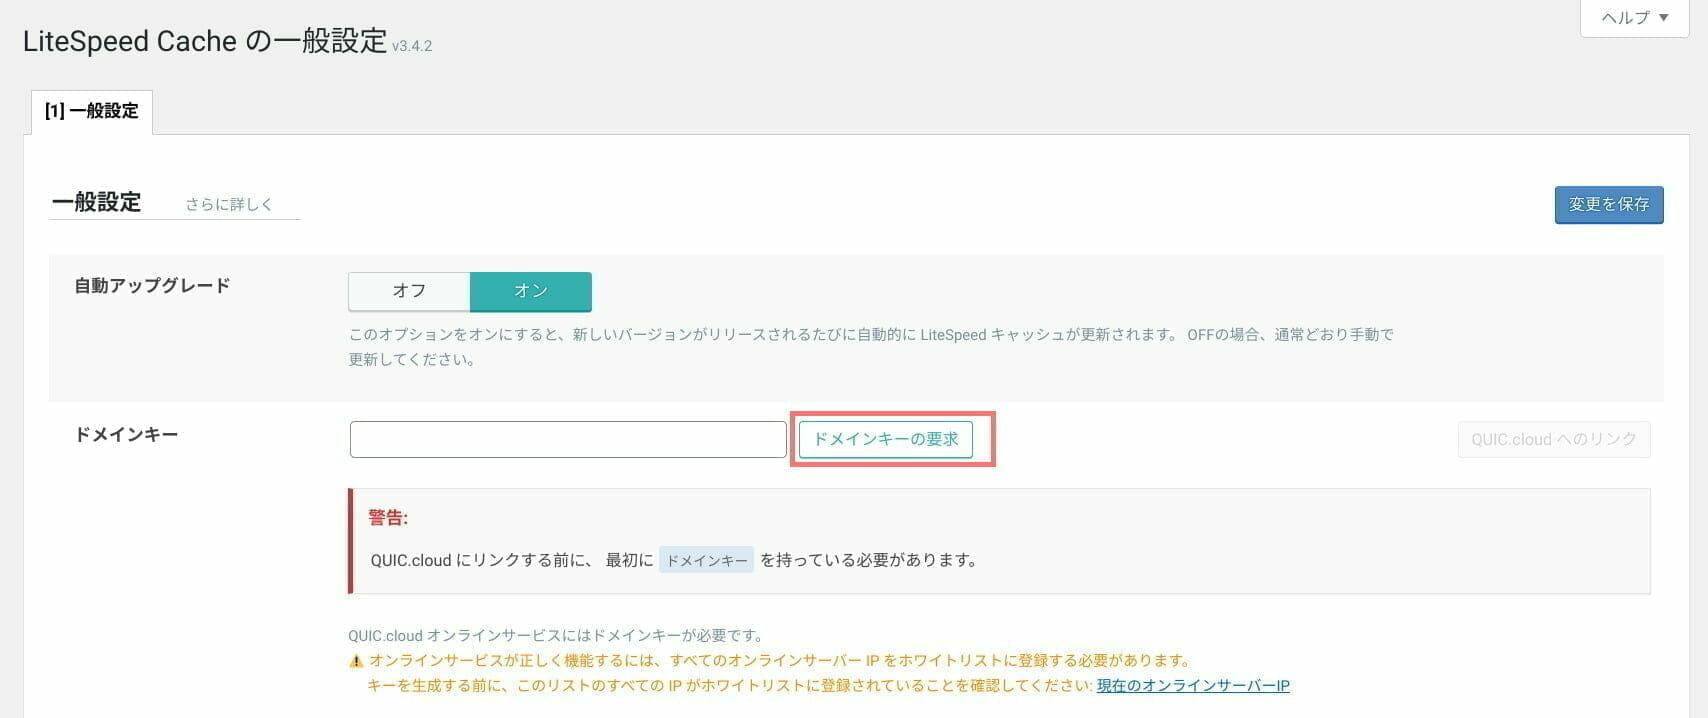 LiteSpeed cache:ドメインキーの取得